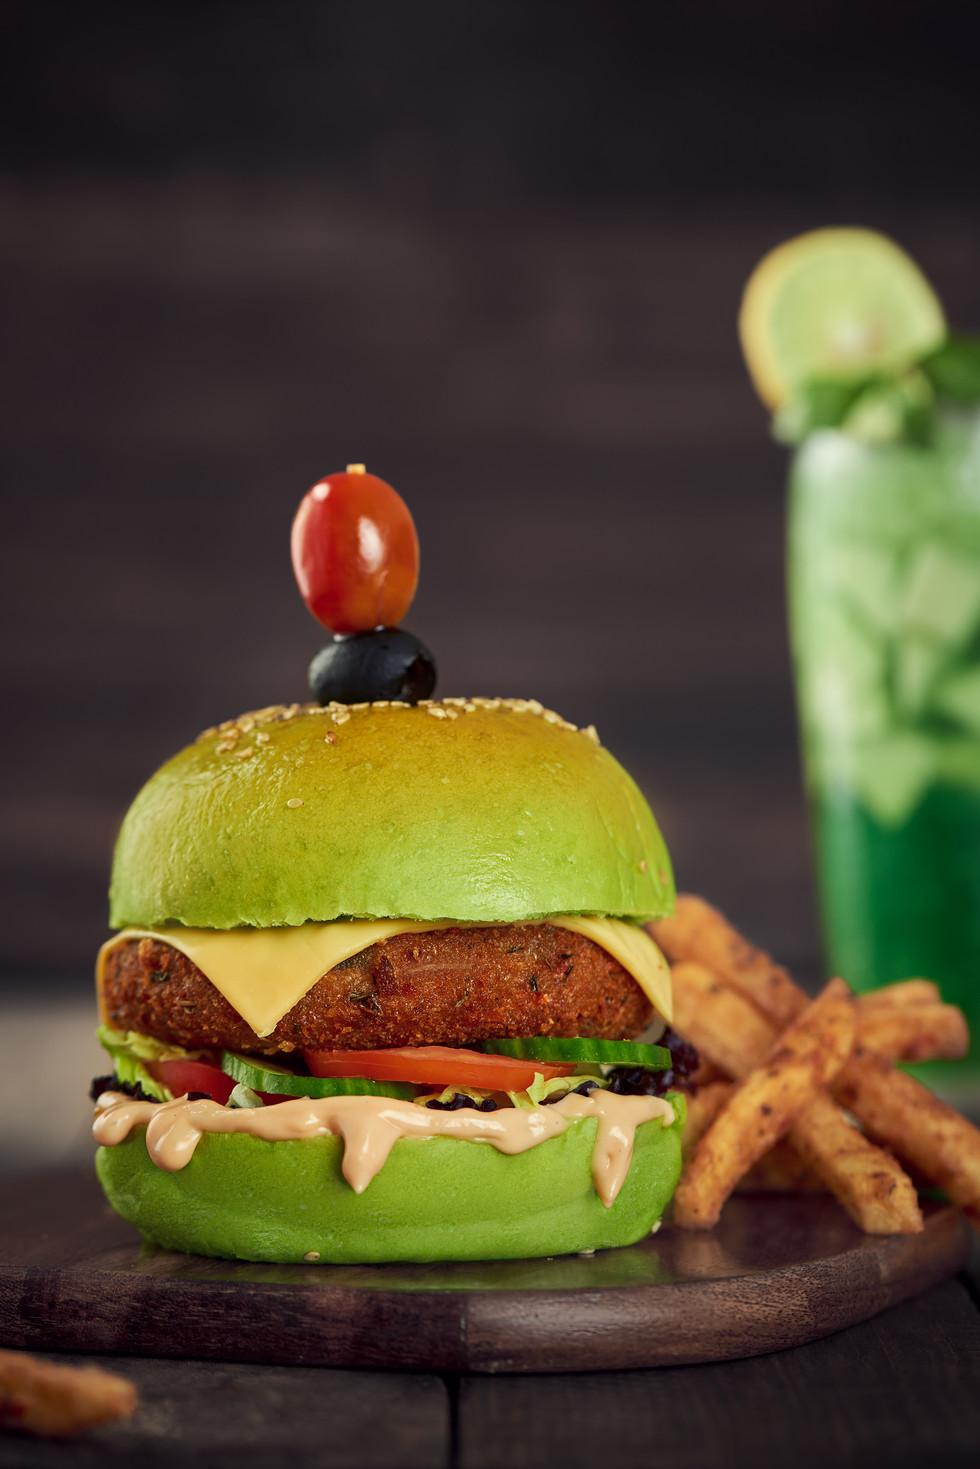 FOOD & BEVERAGE PHOTOGRAPHY